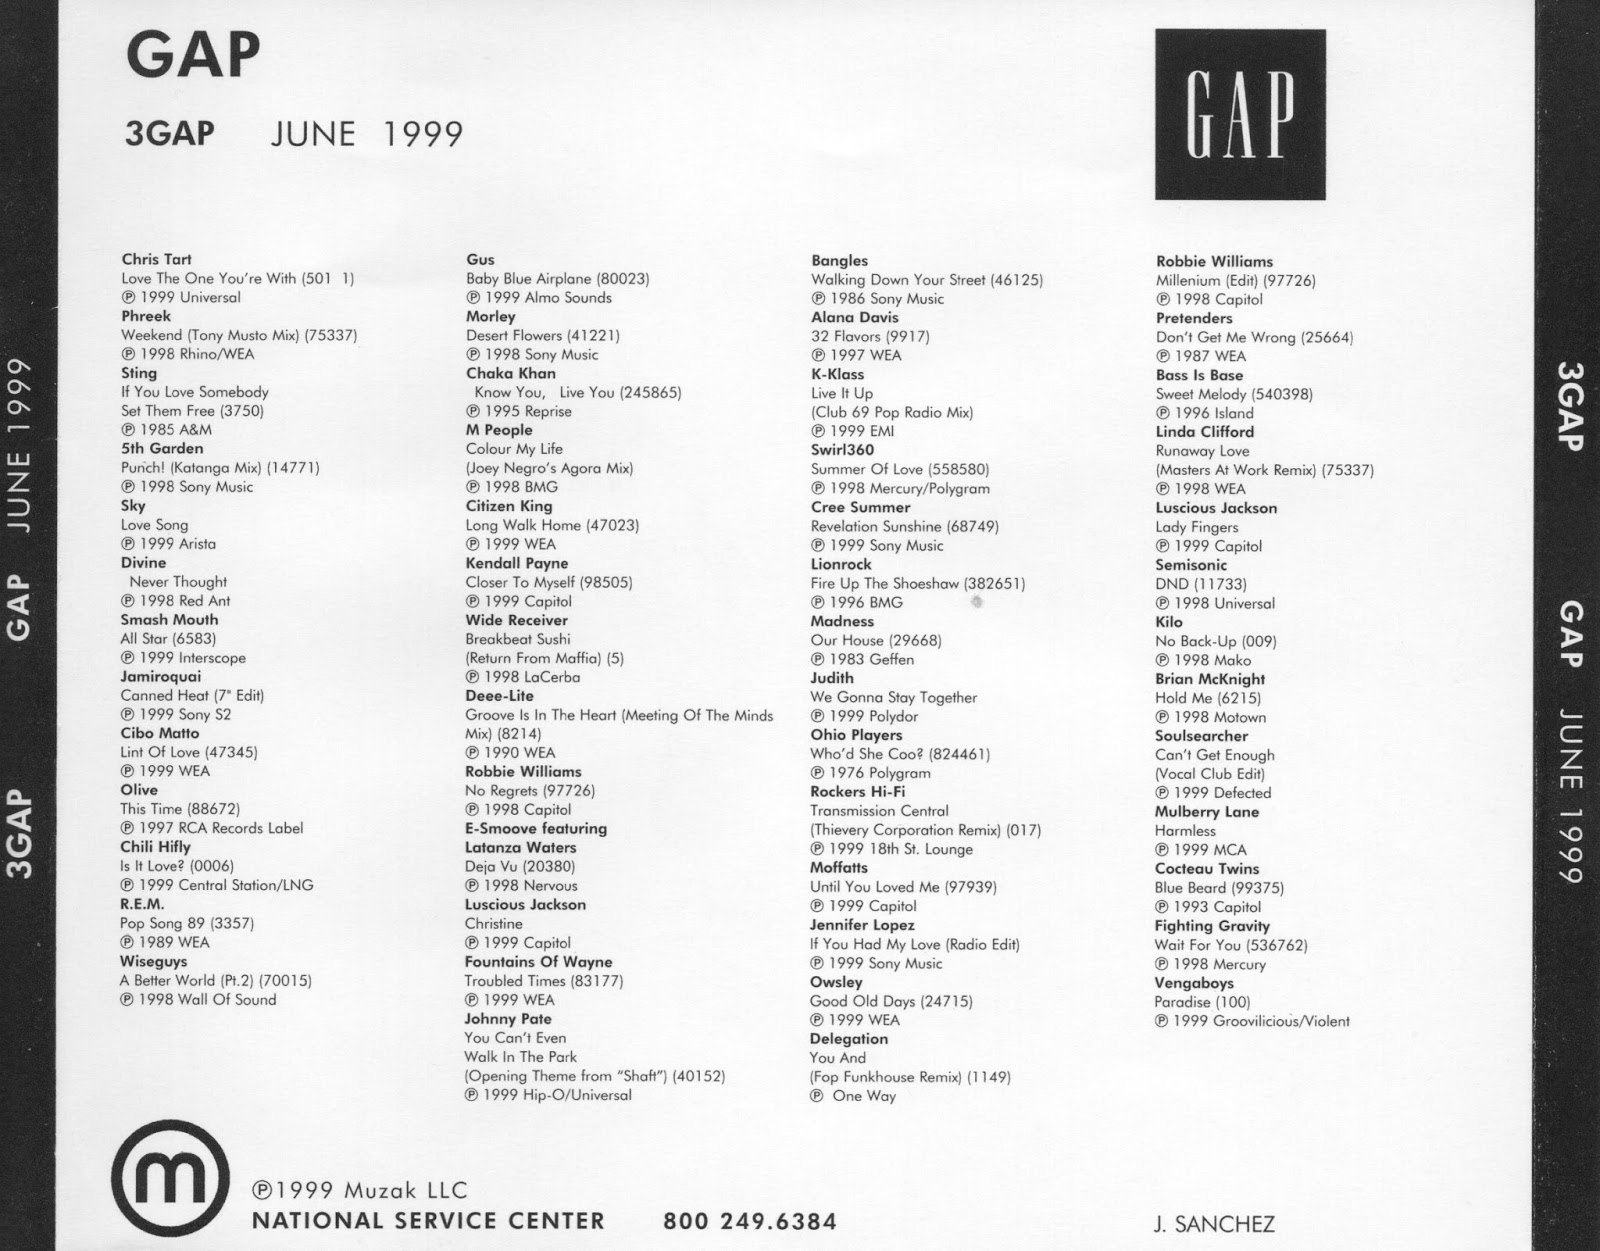 Gap 1999 In-Store Playlists | Gap In-Store Playlists 1992 to 2006